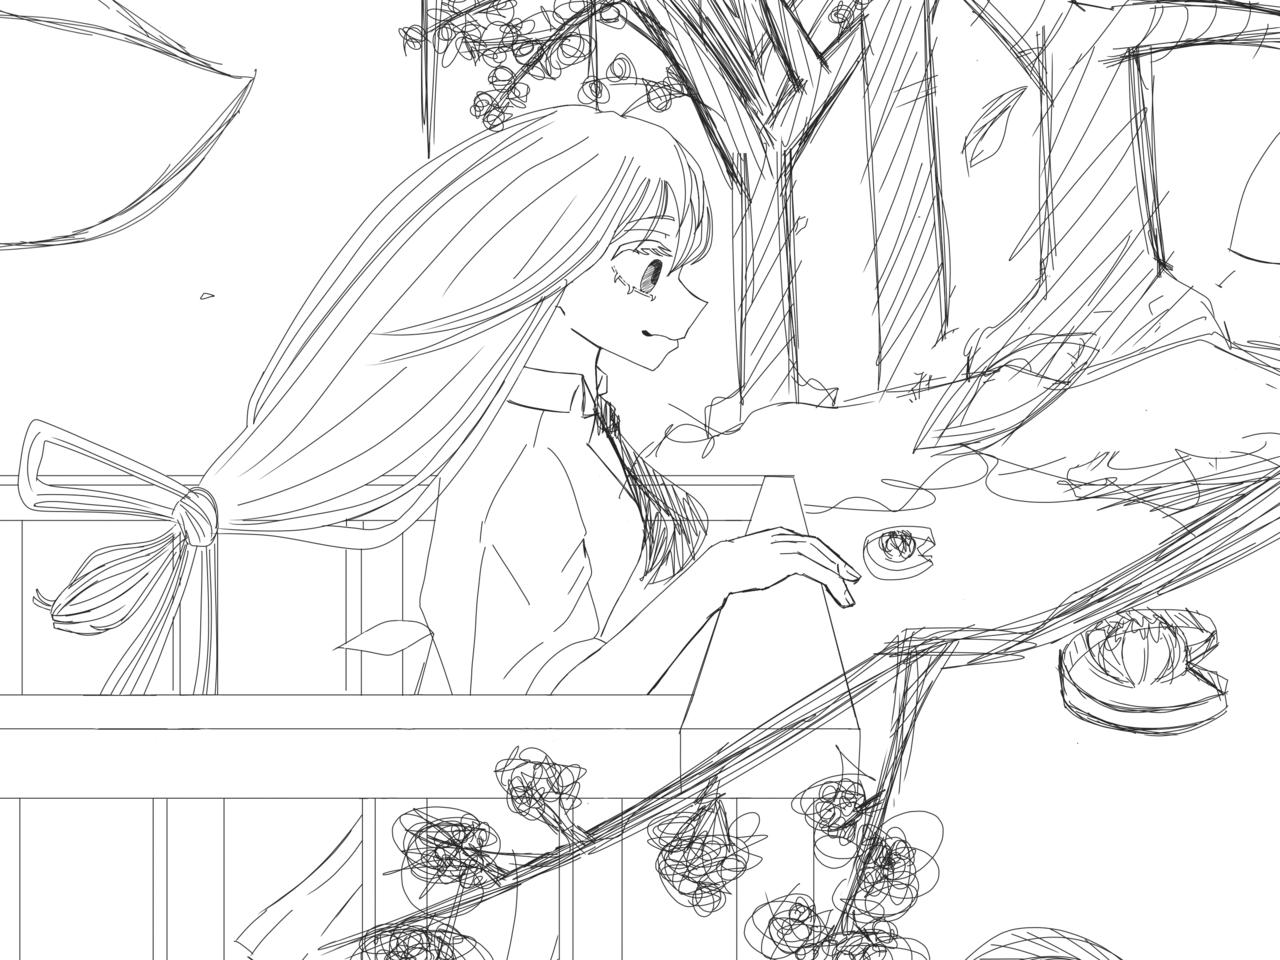 Request (rough sketch) Illust of Dekuchan_336(crazy mode?) digital anime Fingerpaint medibangpaint nwn Froppy roughsketch MyHeroAcademia